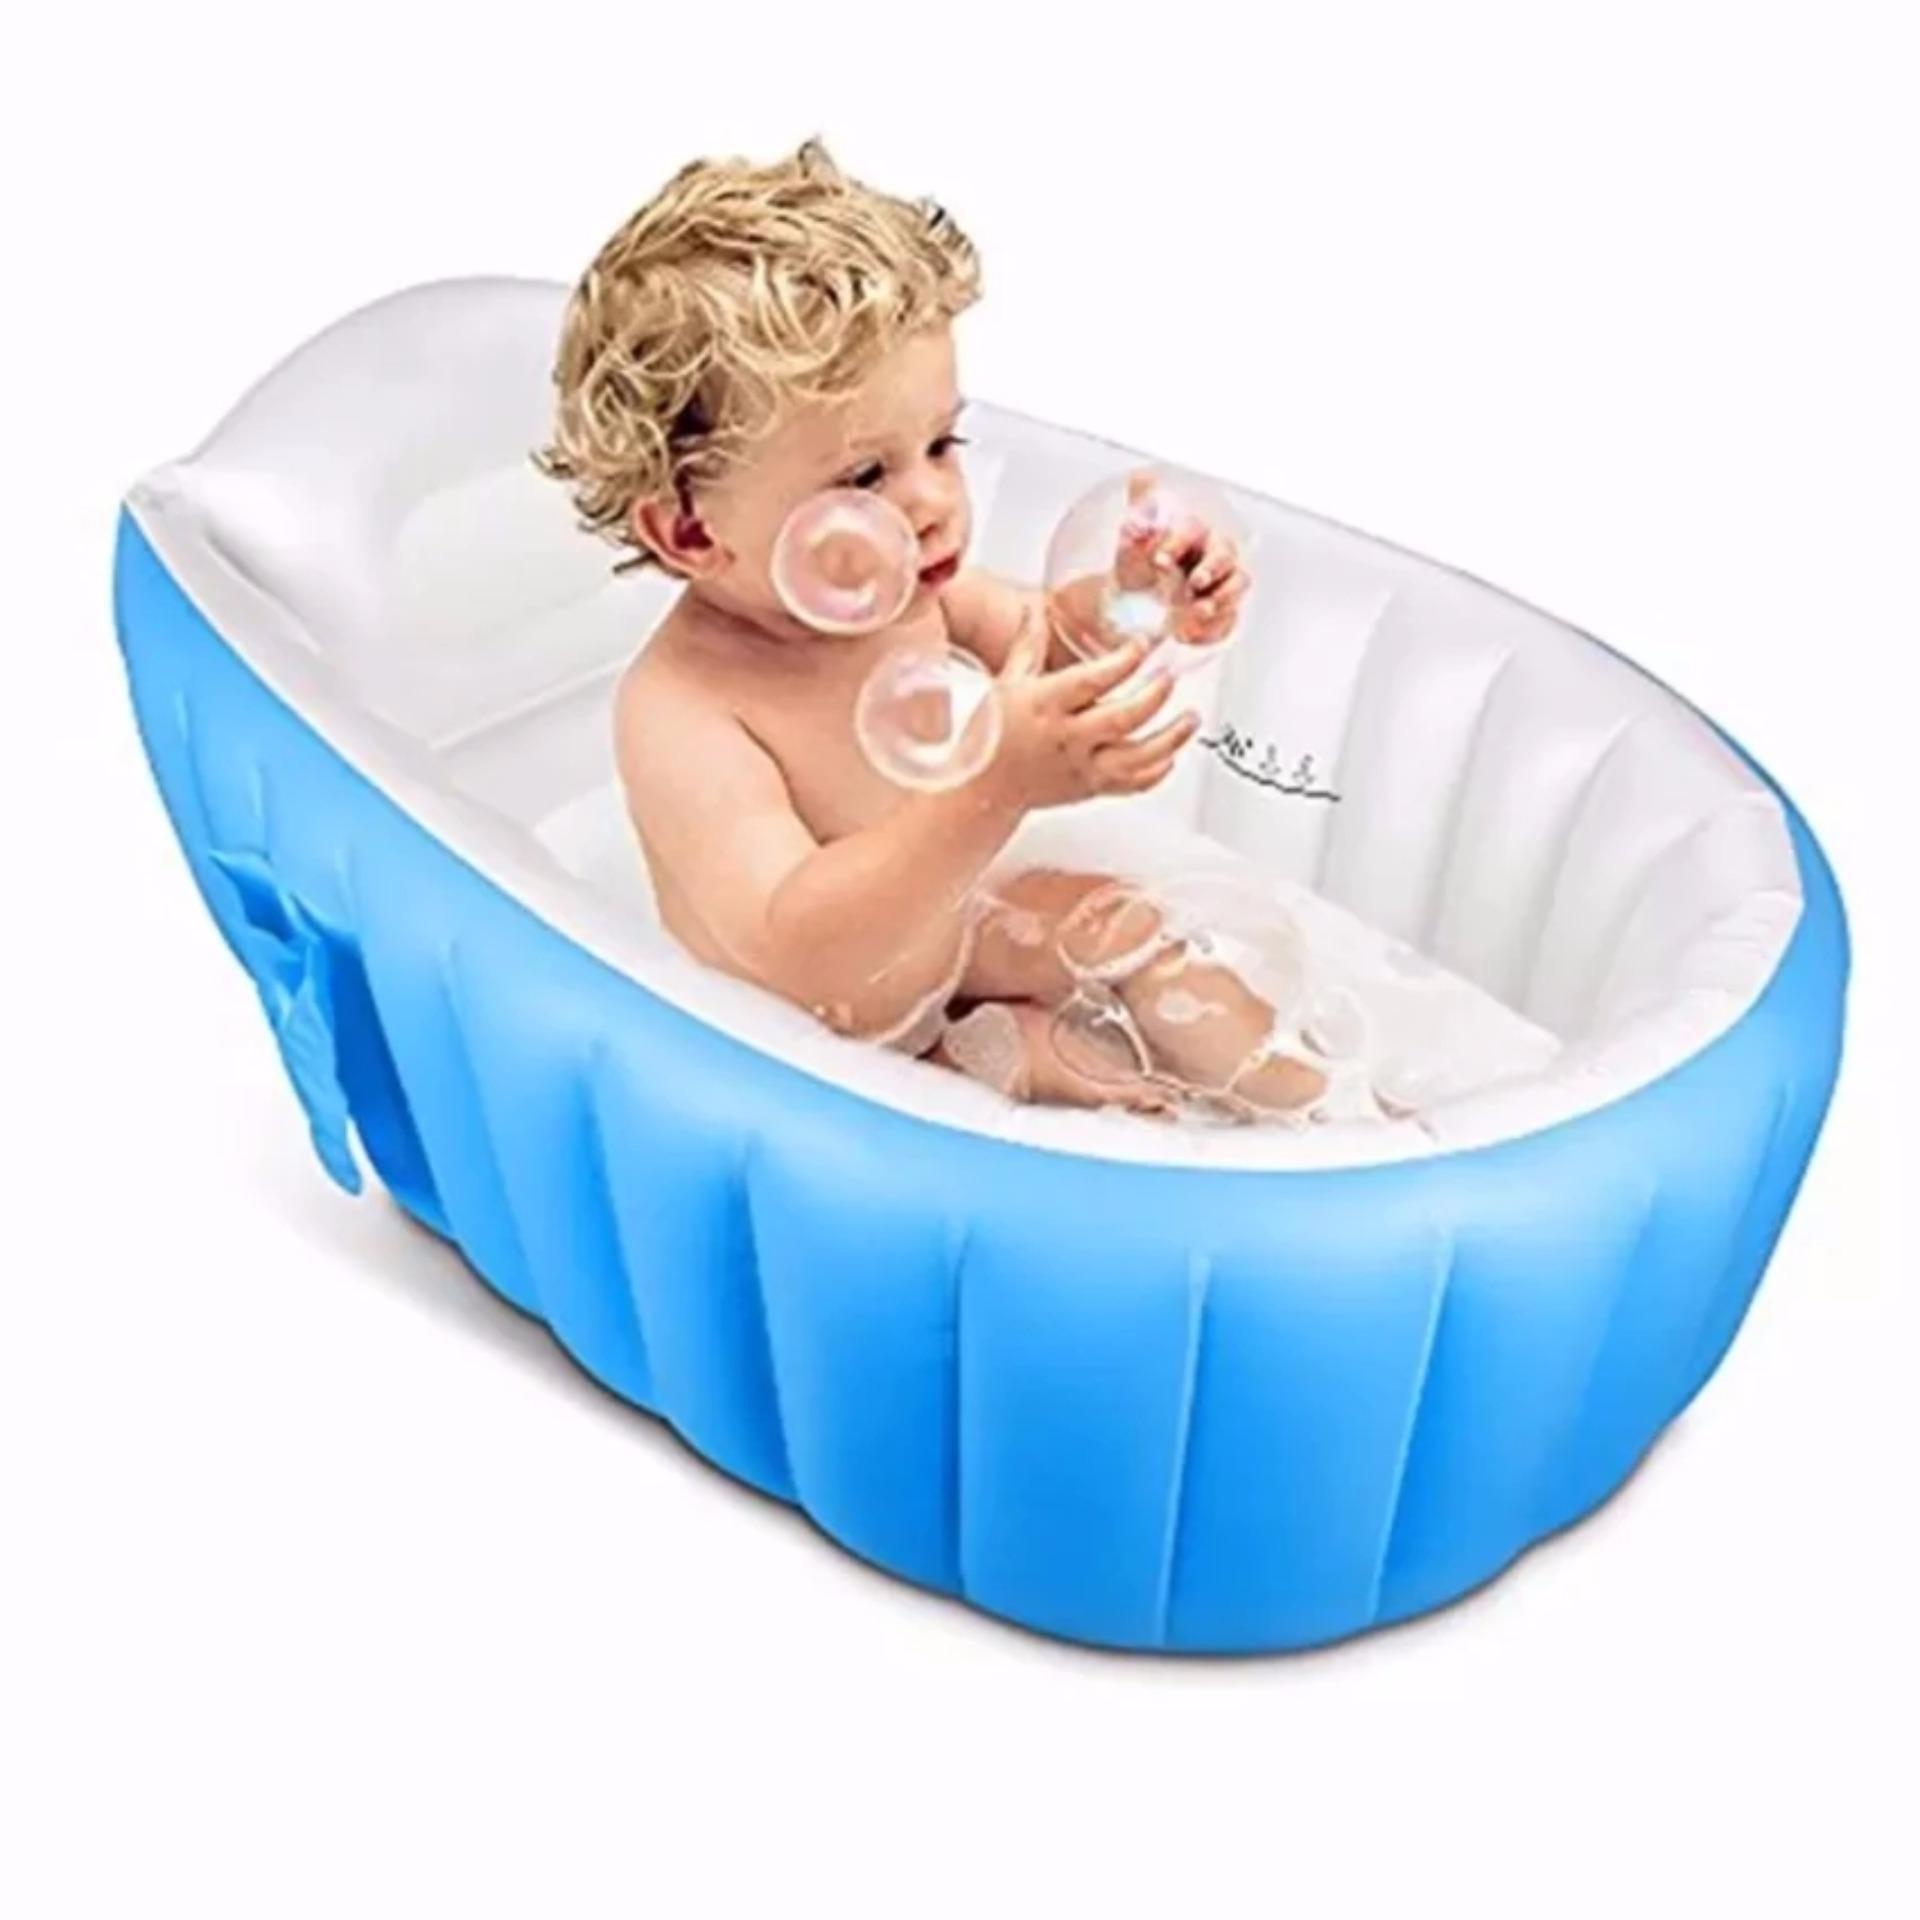 Bathtub Refinishing Kit Rona - Bathtub Ideas